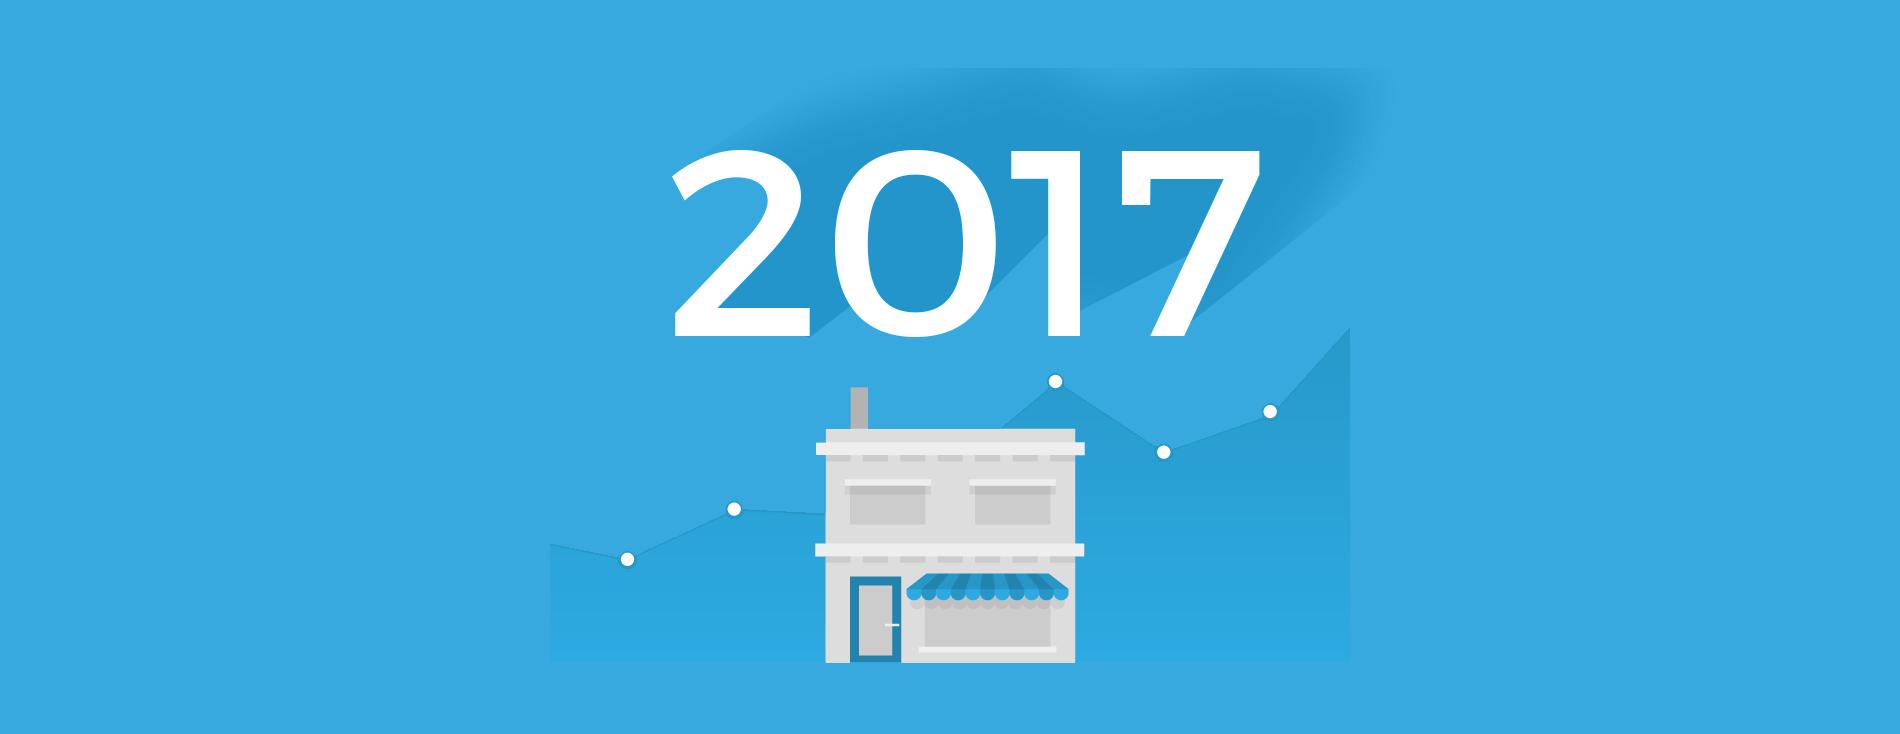 online marketing in 2017